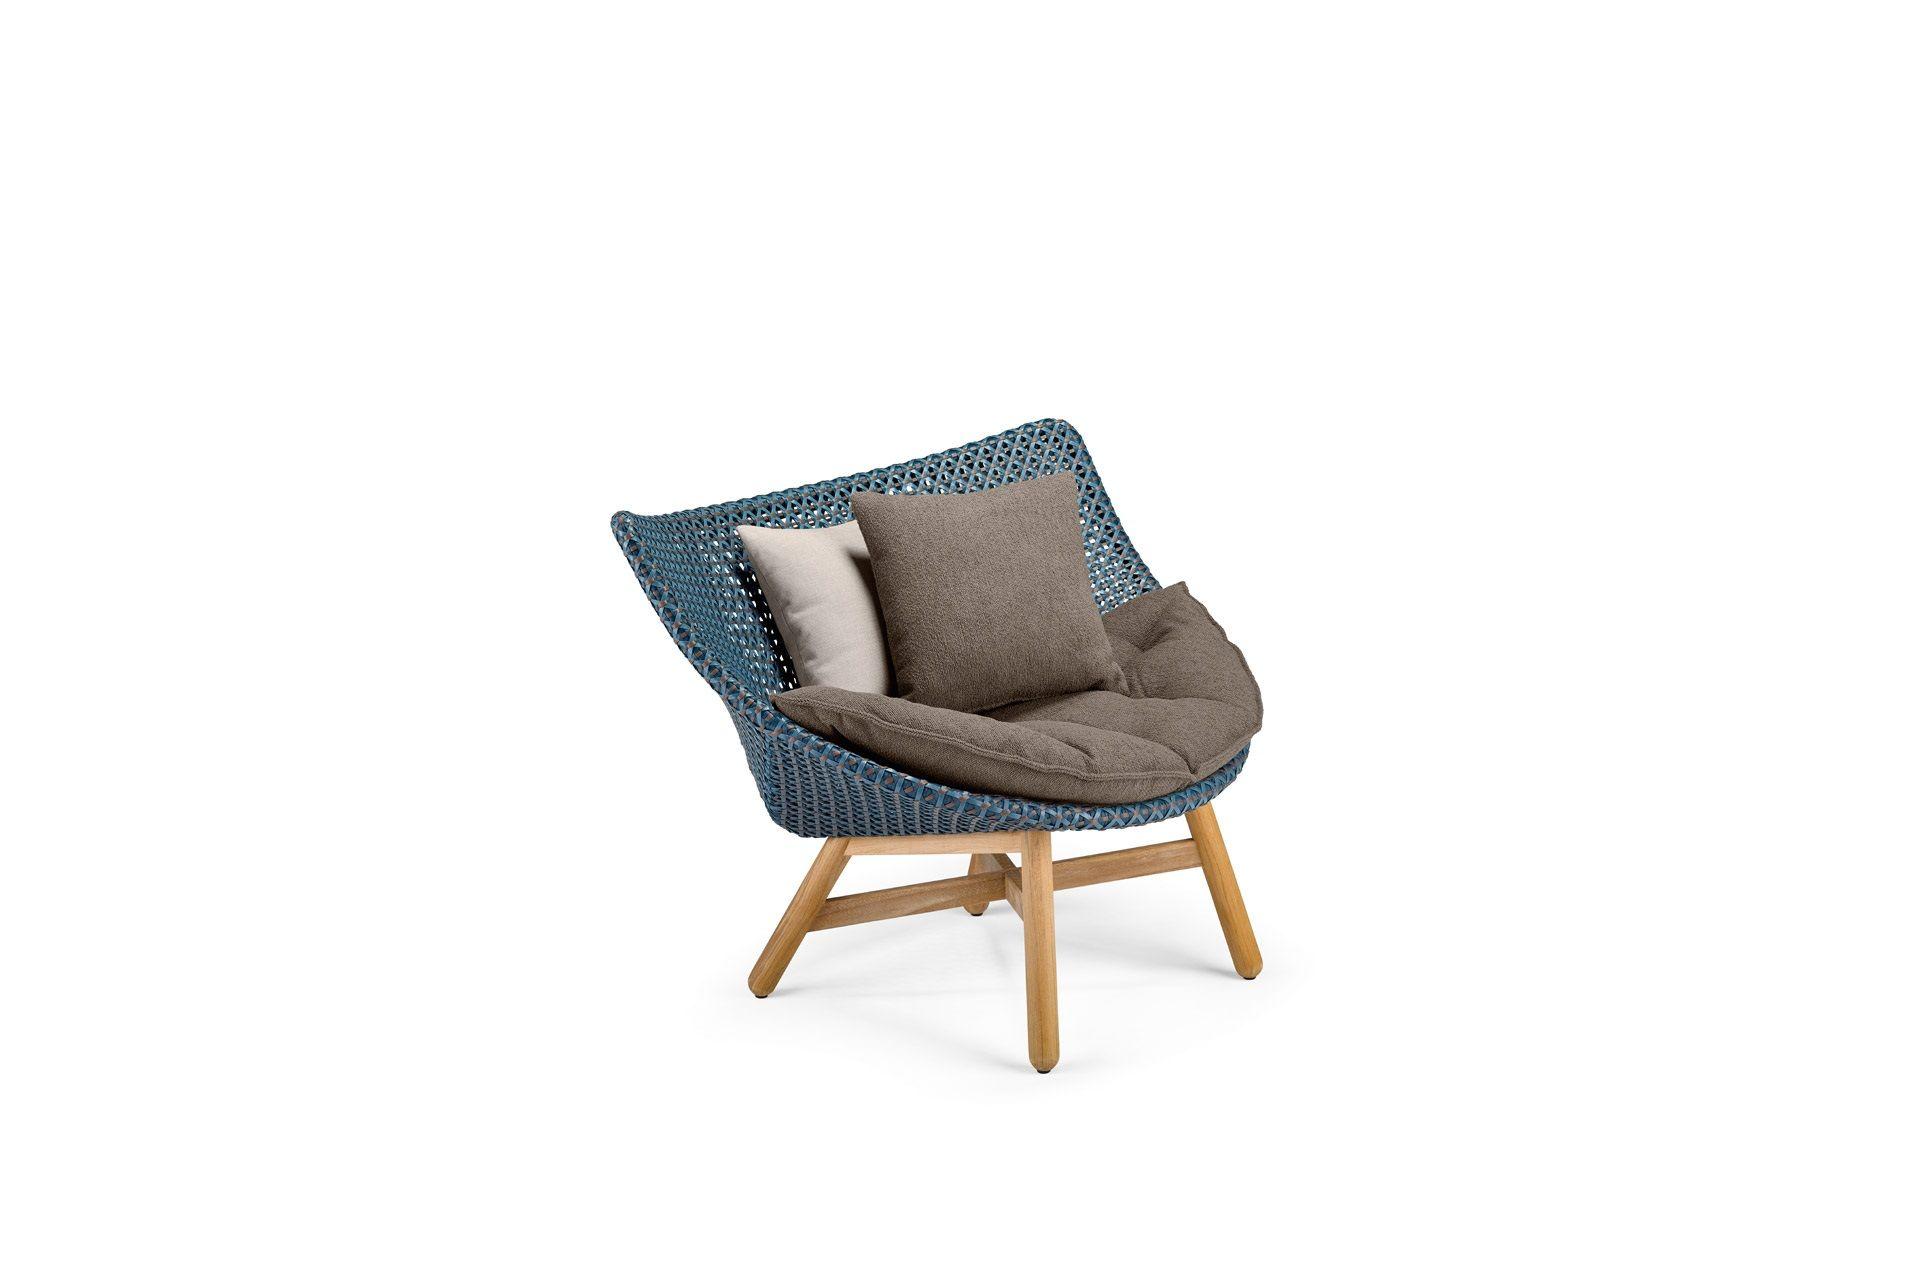 Dedon Mbrace Lounge Chair Courtyard Lounge Sessel Garten Aussenmobel Sessel